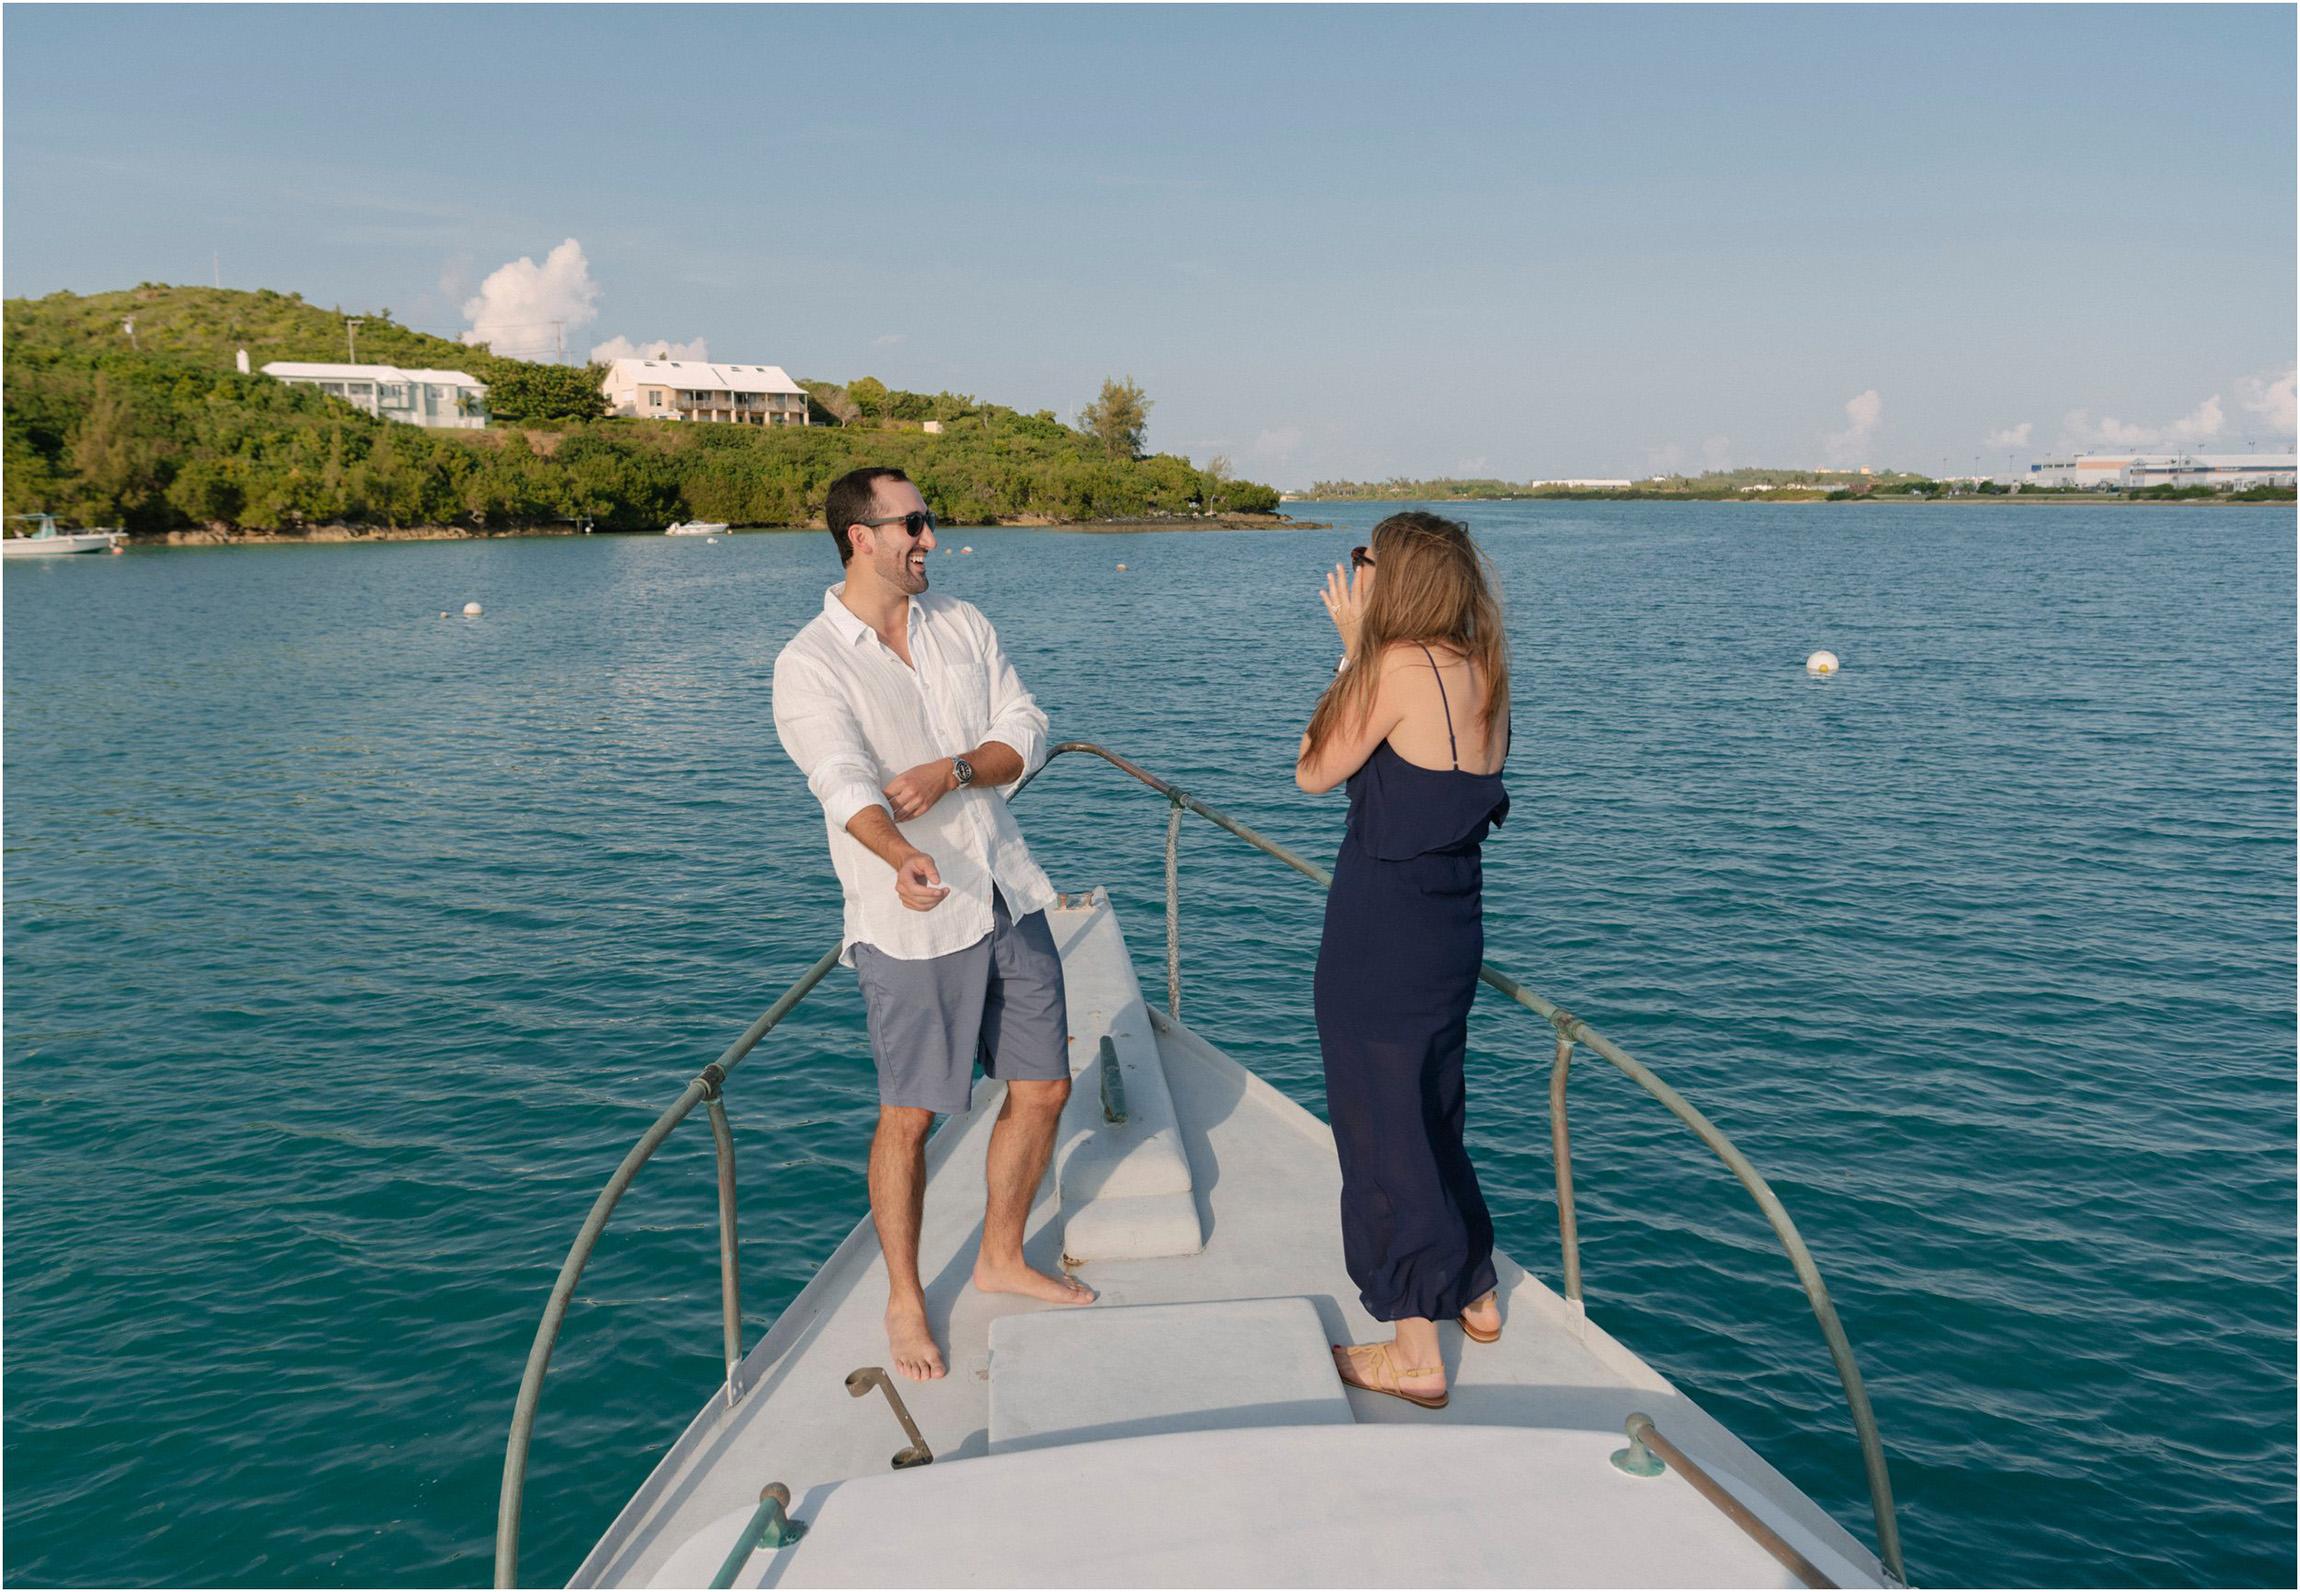 ©FianderFoto_Proposal Photographer_Bermuda_Kelly_Mike_008.jpg